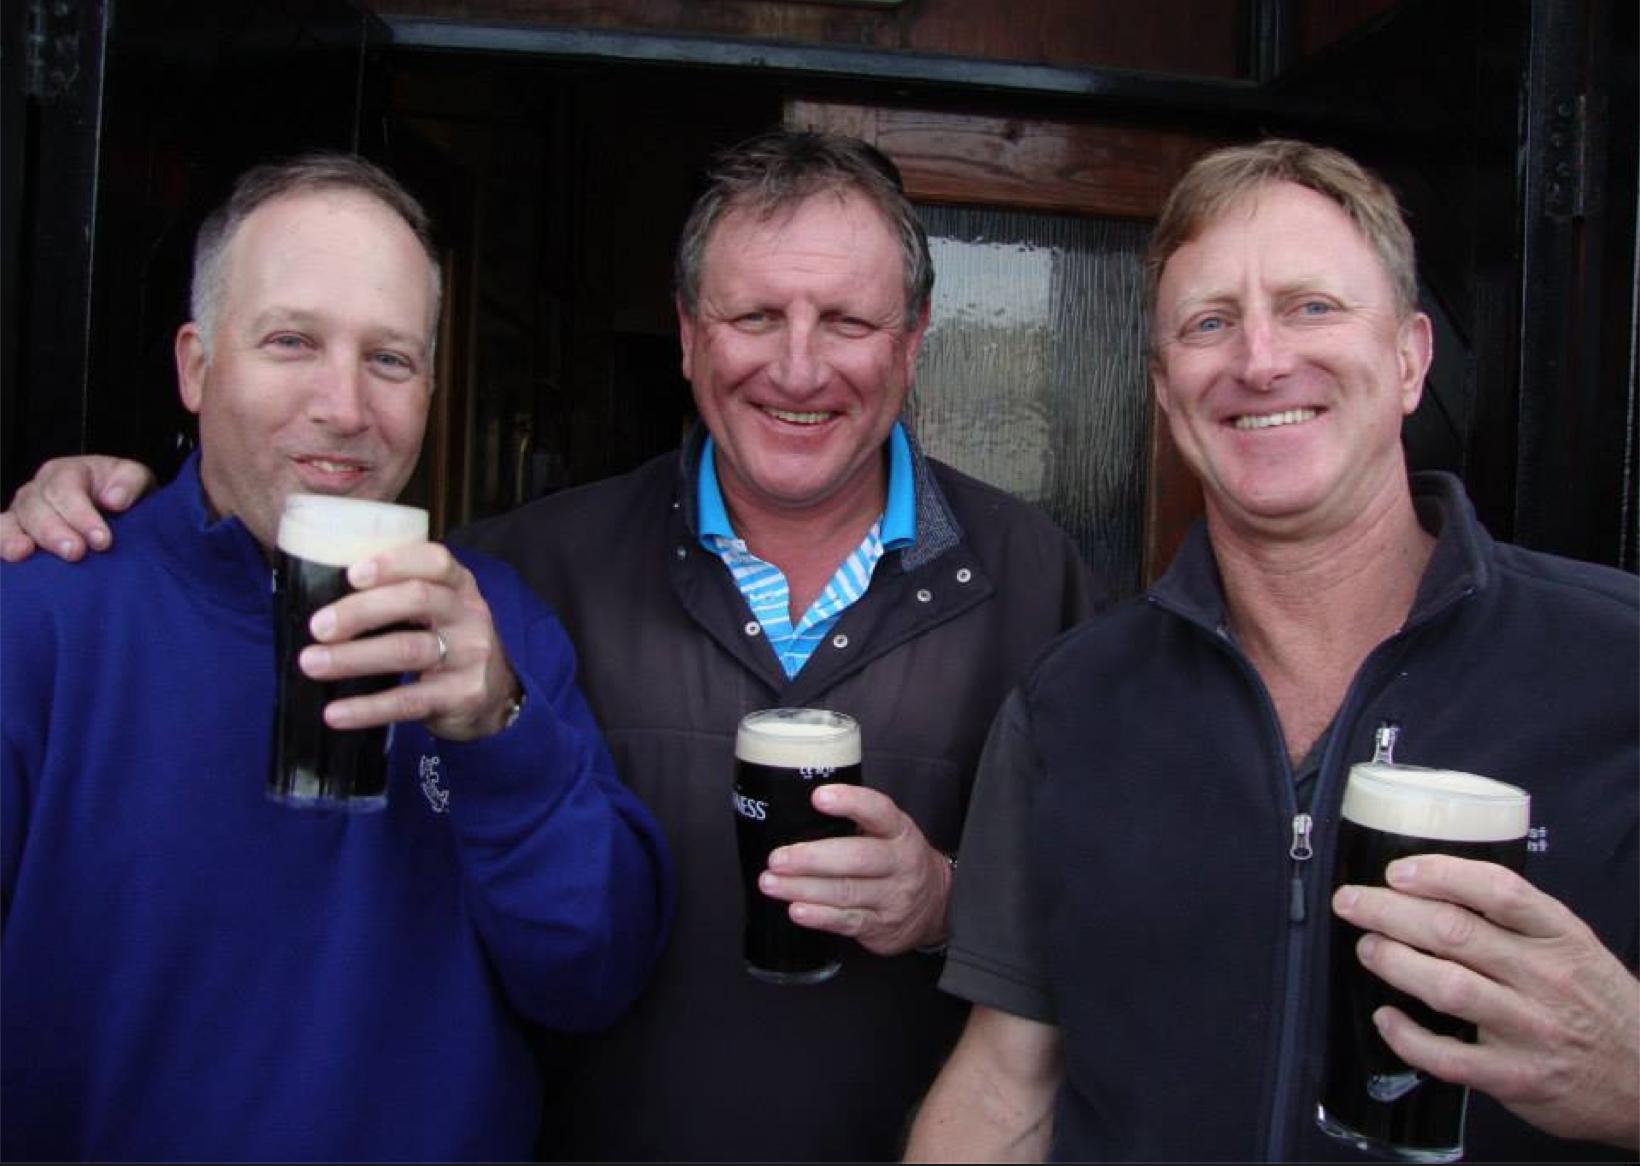 Kevin Dobson: The Harbour Bar, Portrush - TheGolfPA.com